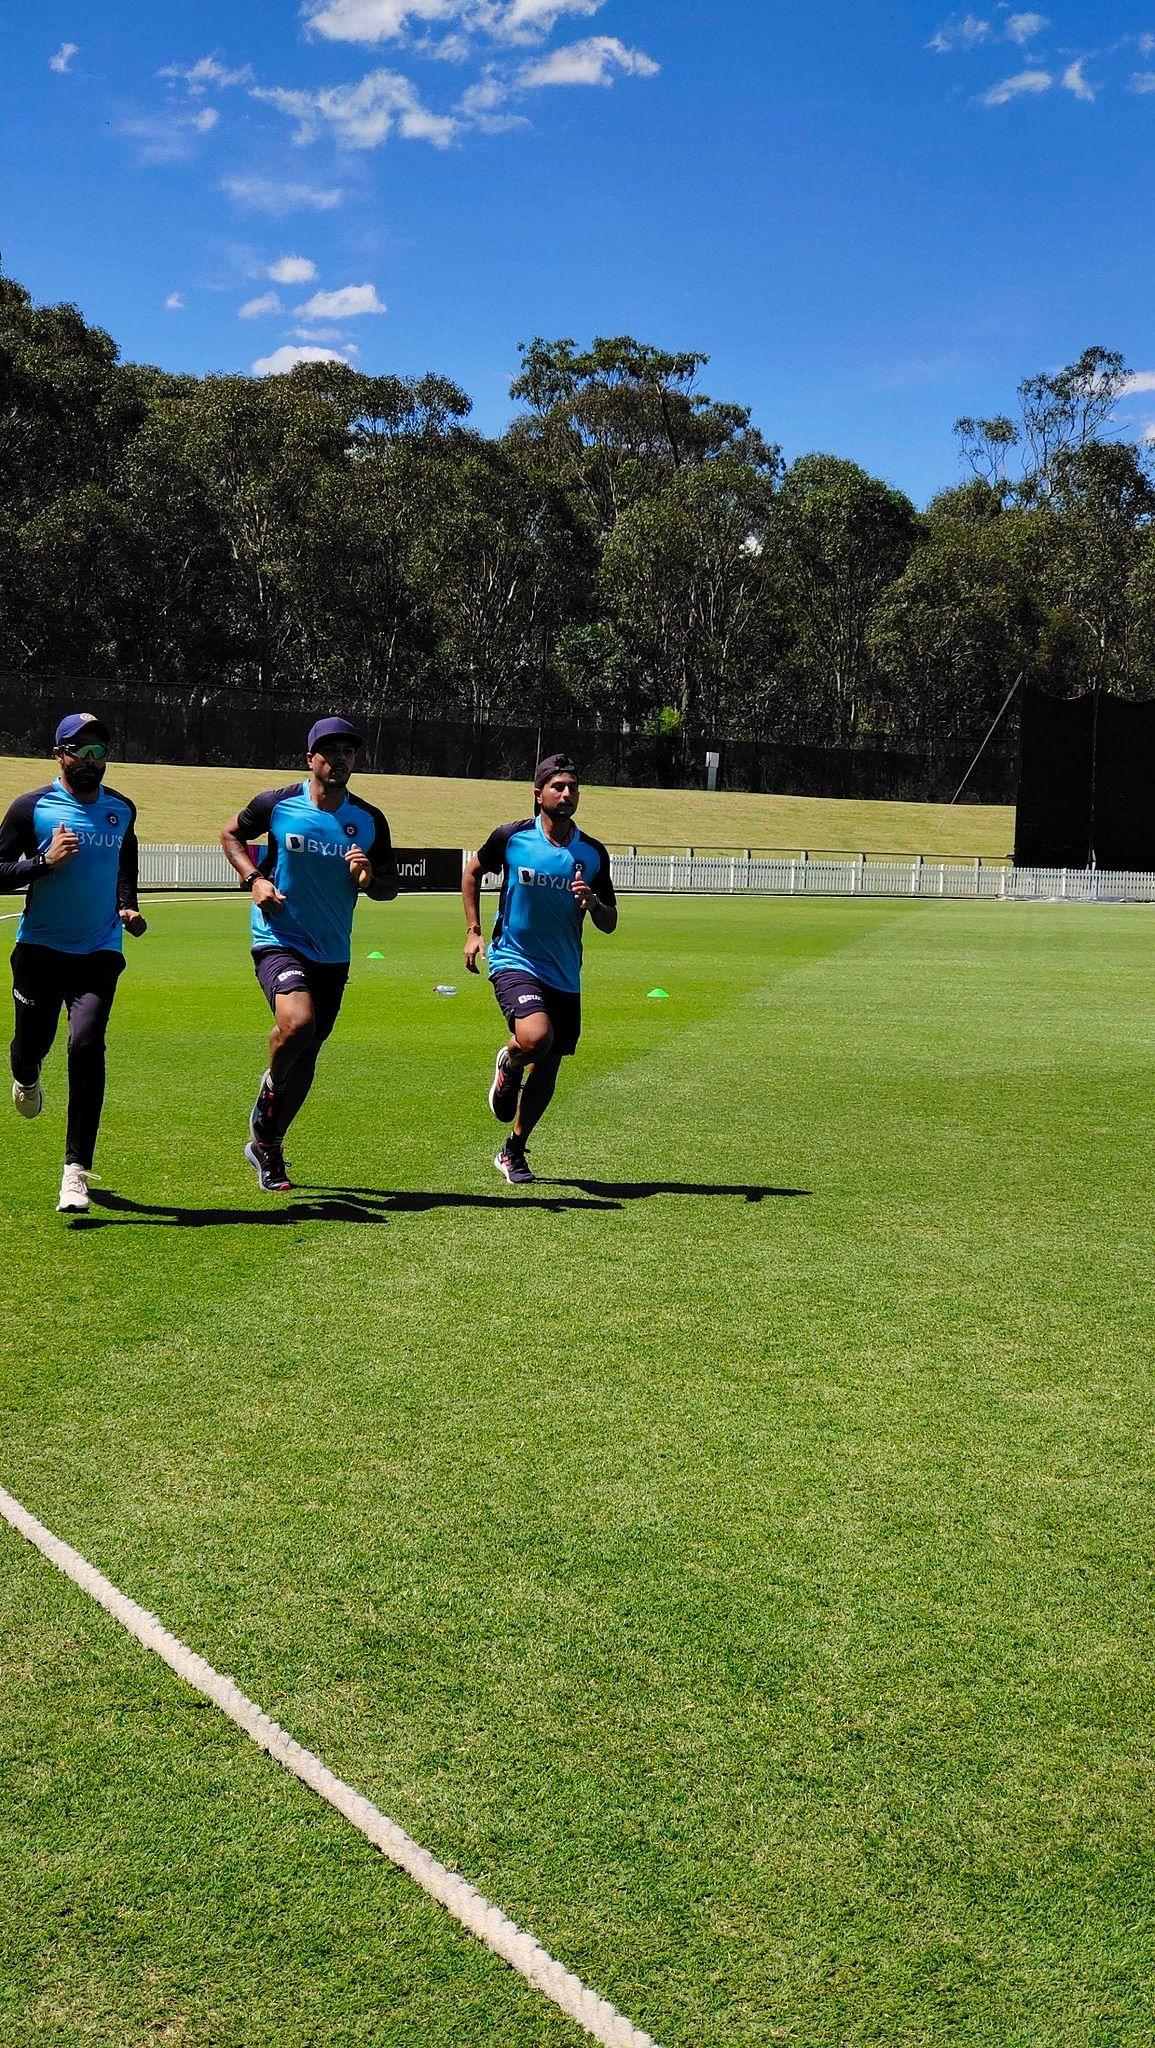 In Pics: Team India begin training sessions in Sydney ahead of Australia tour